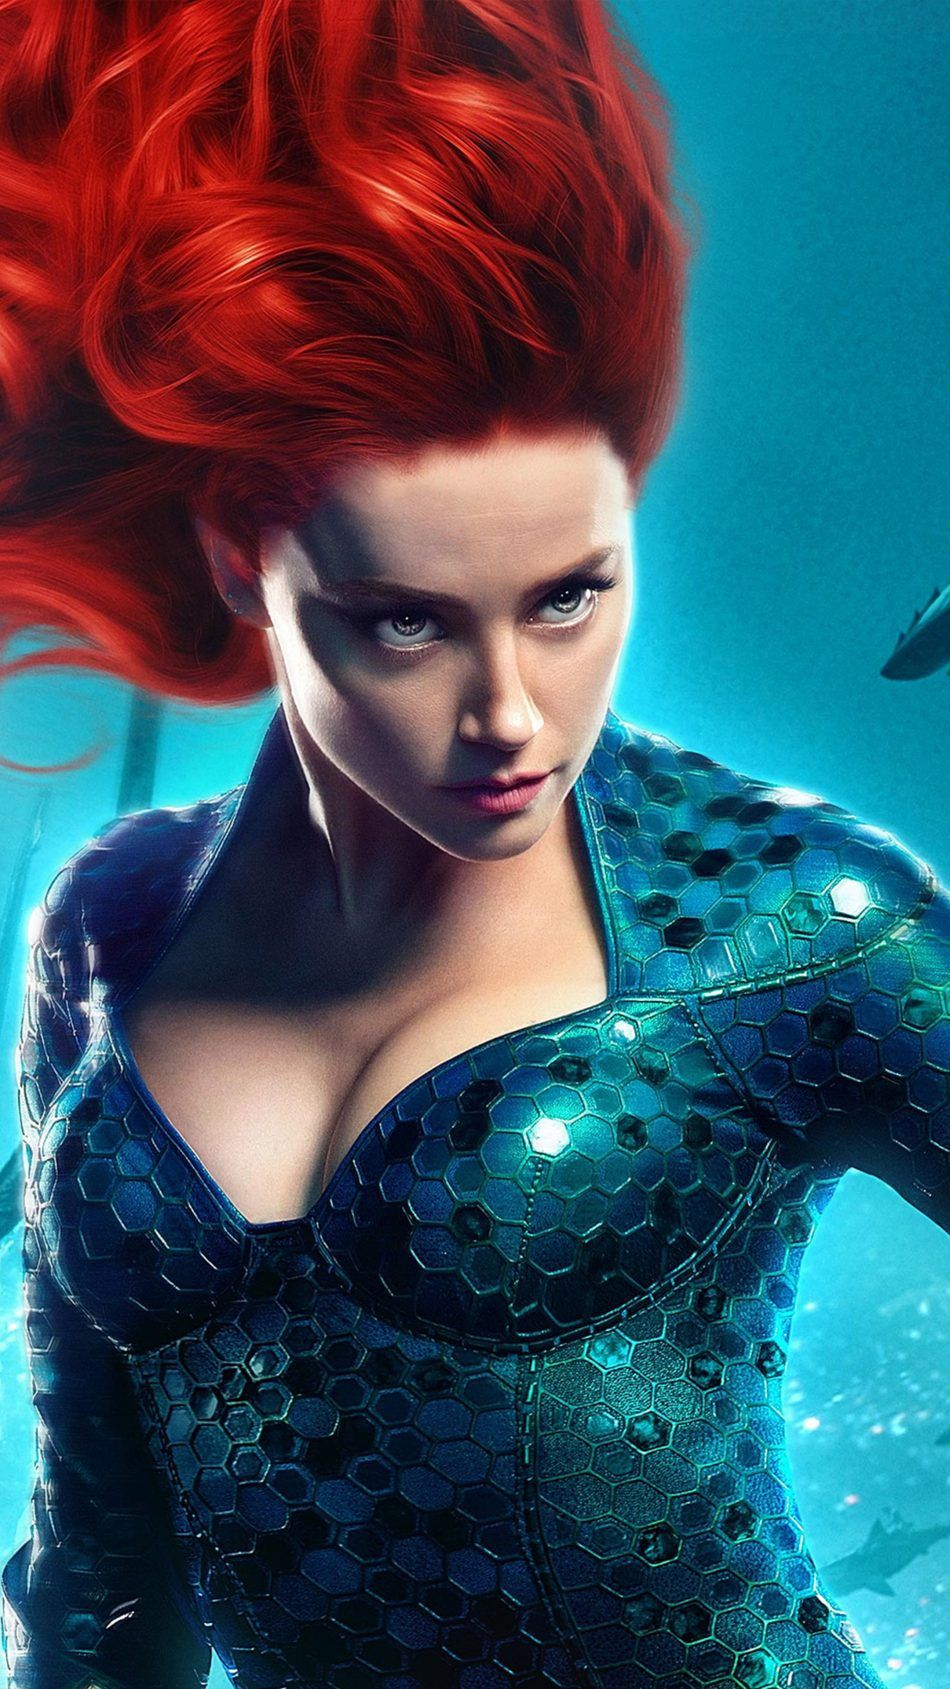 Amber Heard As Mera In Aquaman 2018 Sexy Comic Art Amber heard 950x1689